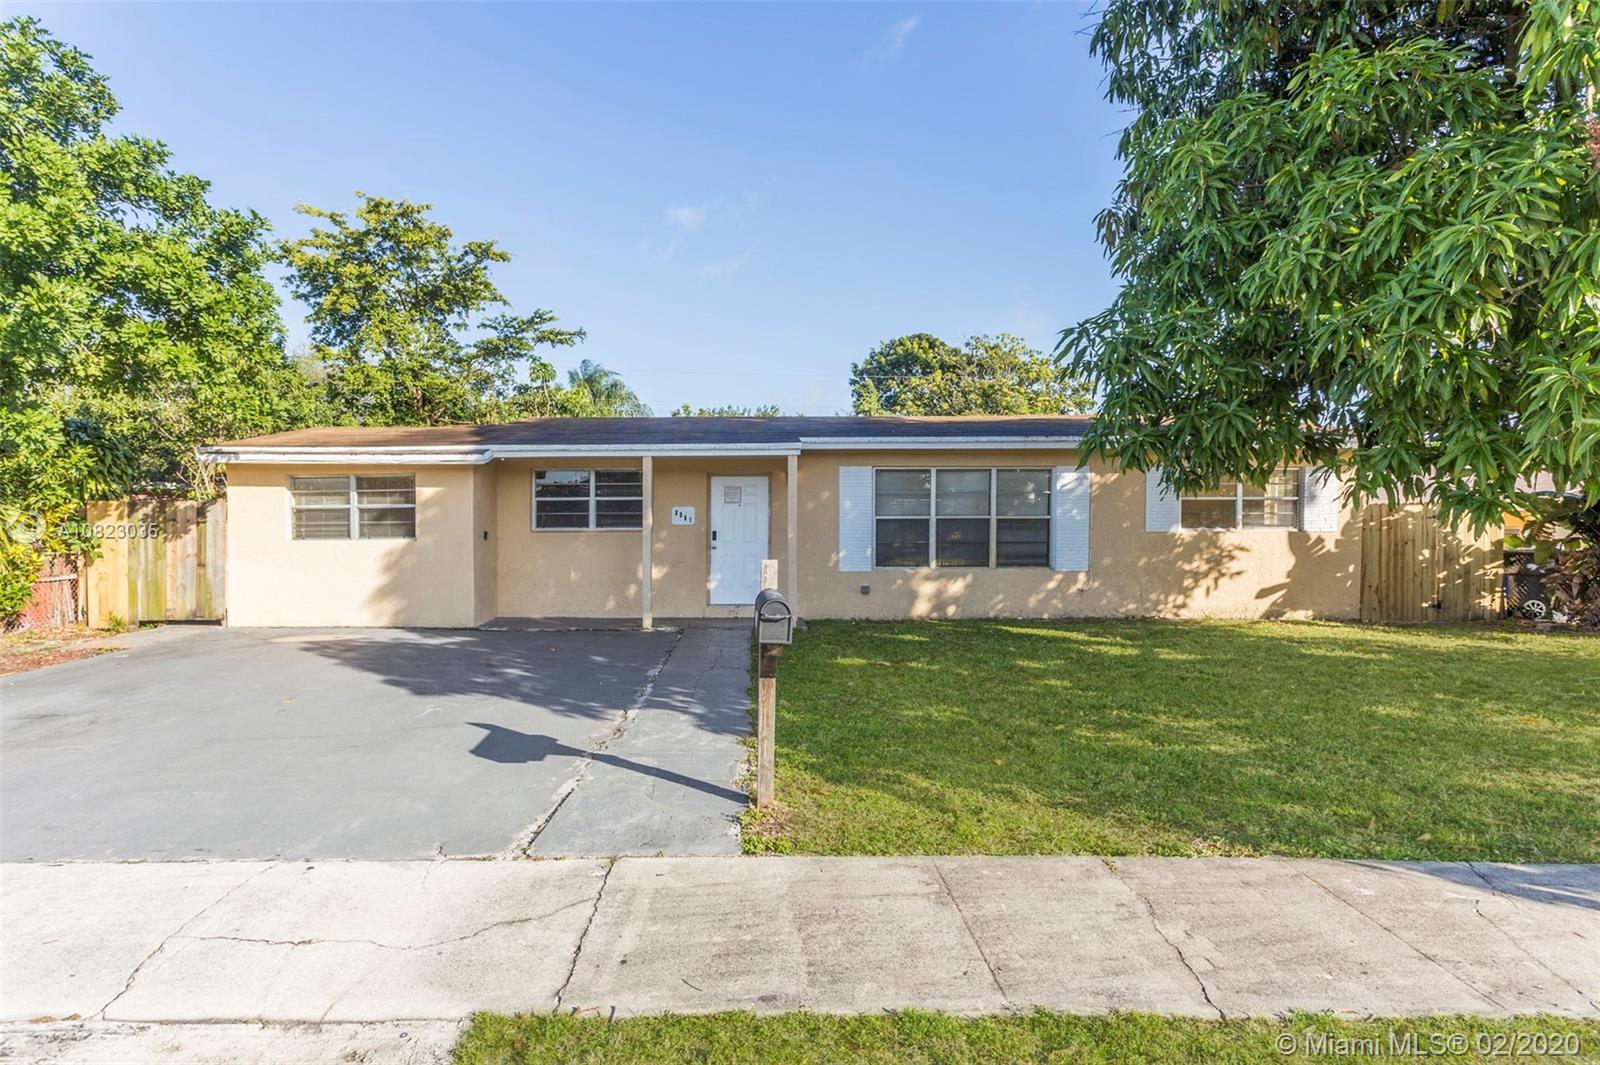 6581 Hayes St, Hollywood, FL 33024 - Hollywood, FL real estate listing